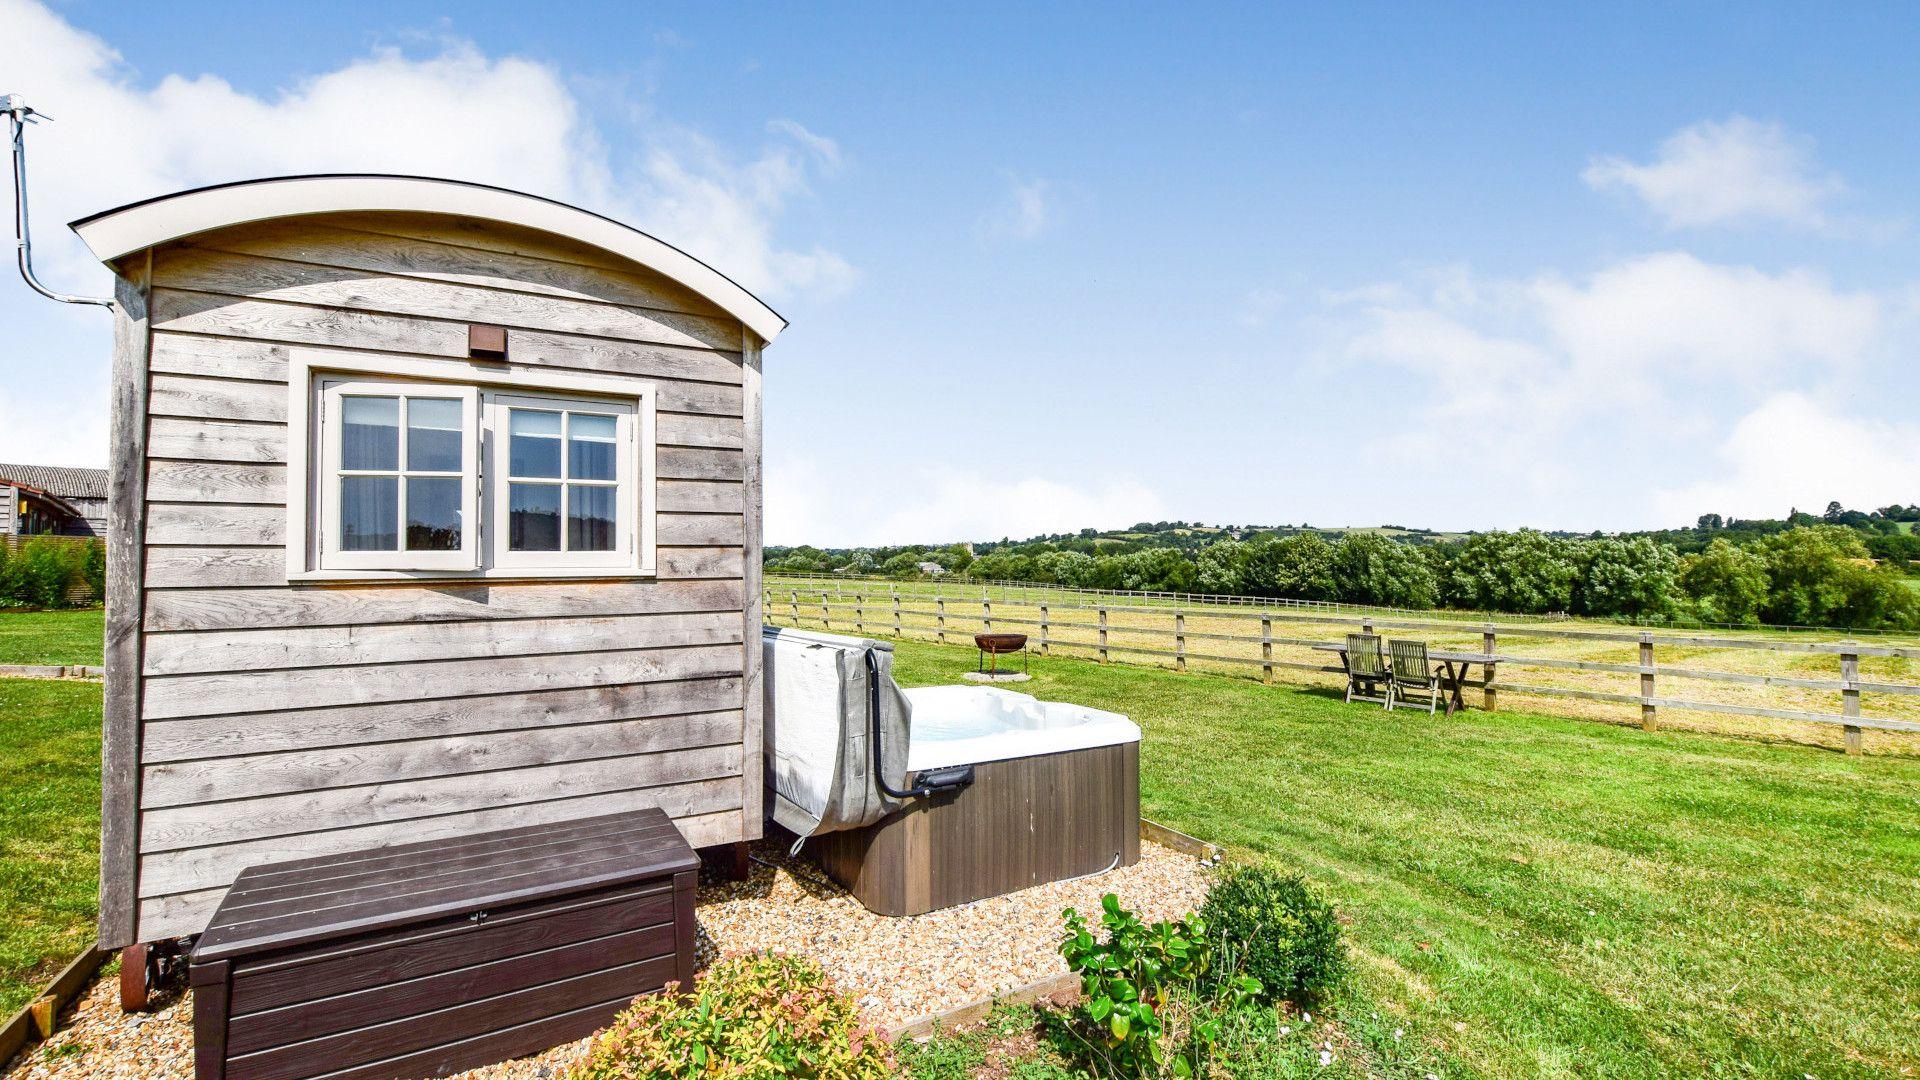 Shepherds Hut at Avon Farm, Bolthole Retreats